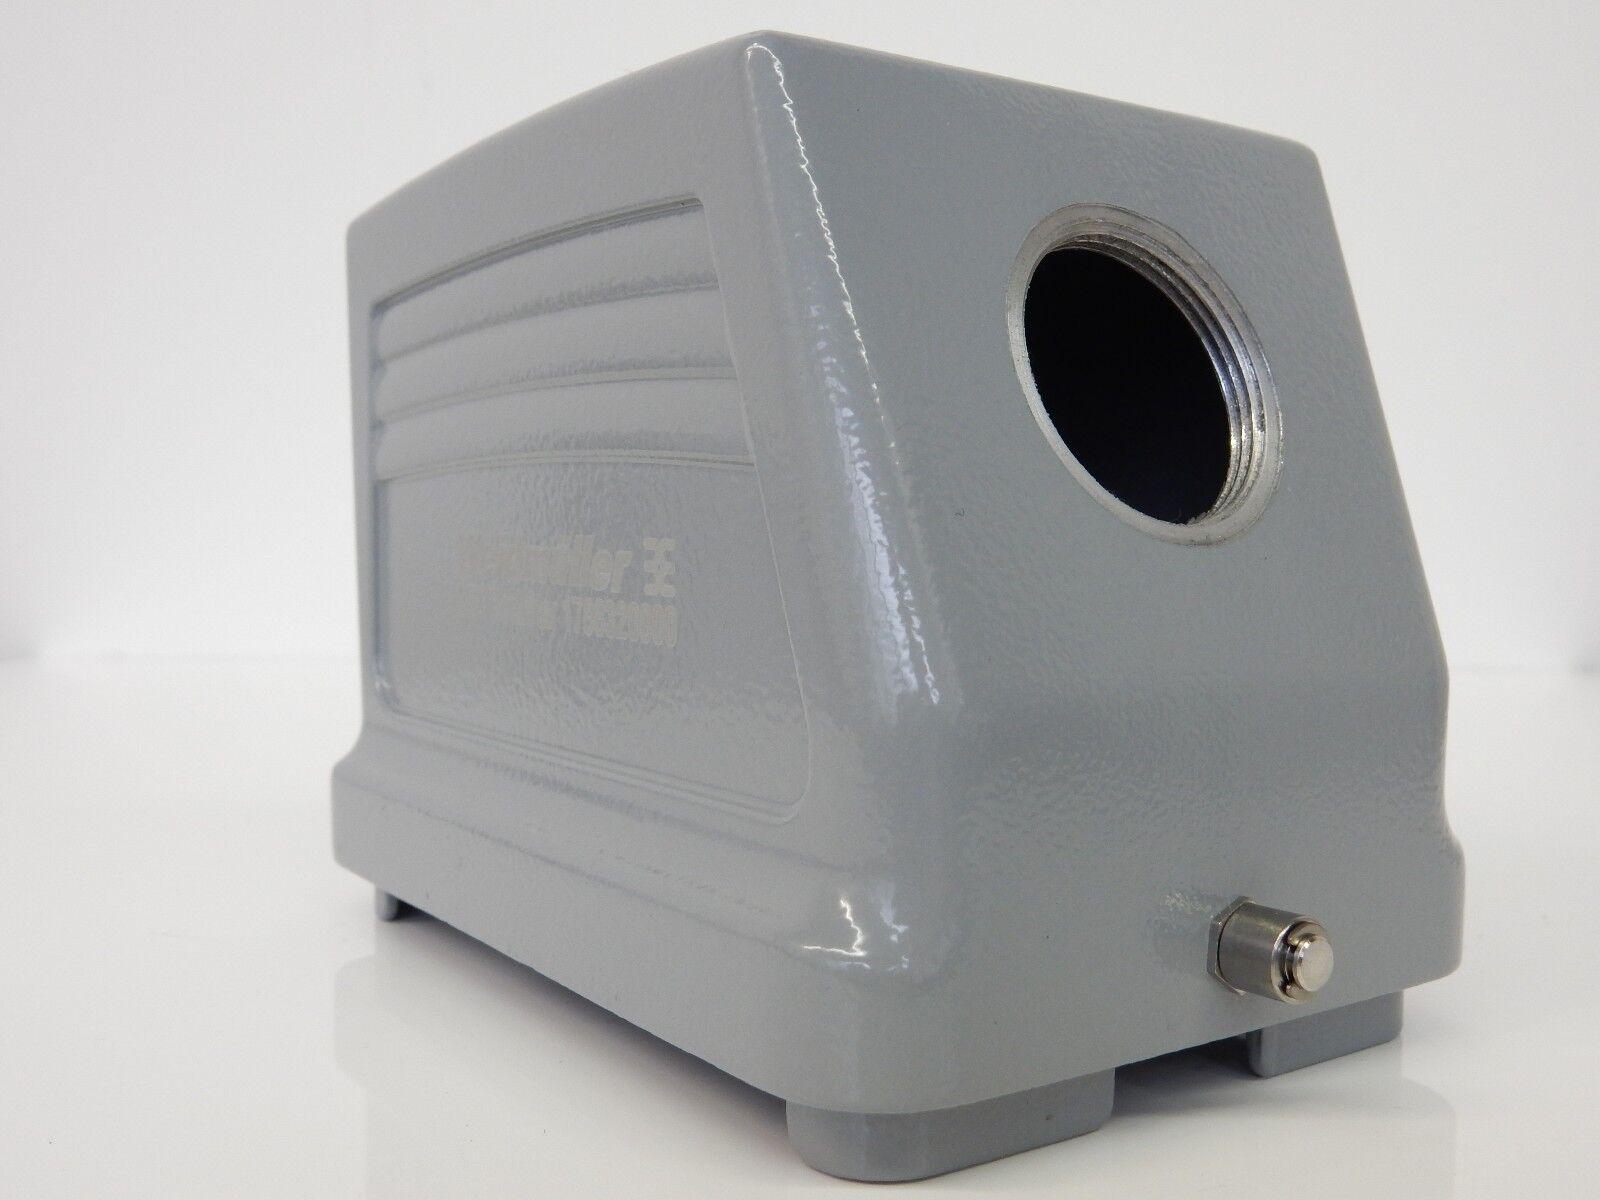 Tüllengehäuse Längsbügel M32 seitl 1788320000 WEIDMÜLLER-  1005 | Stilvoll und lustig